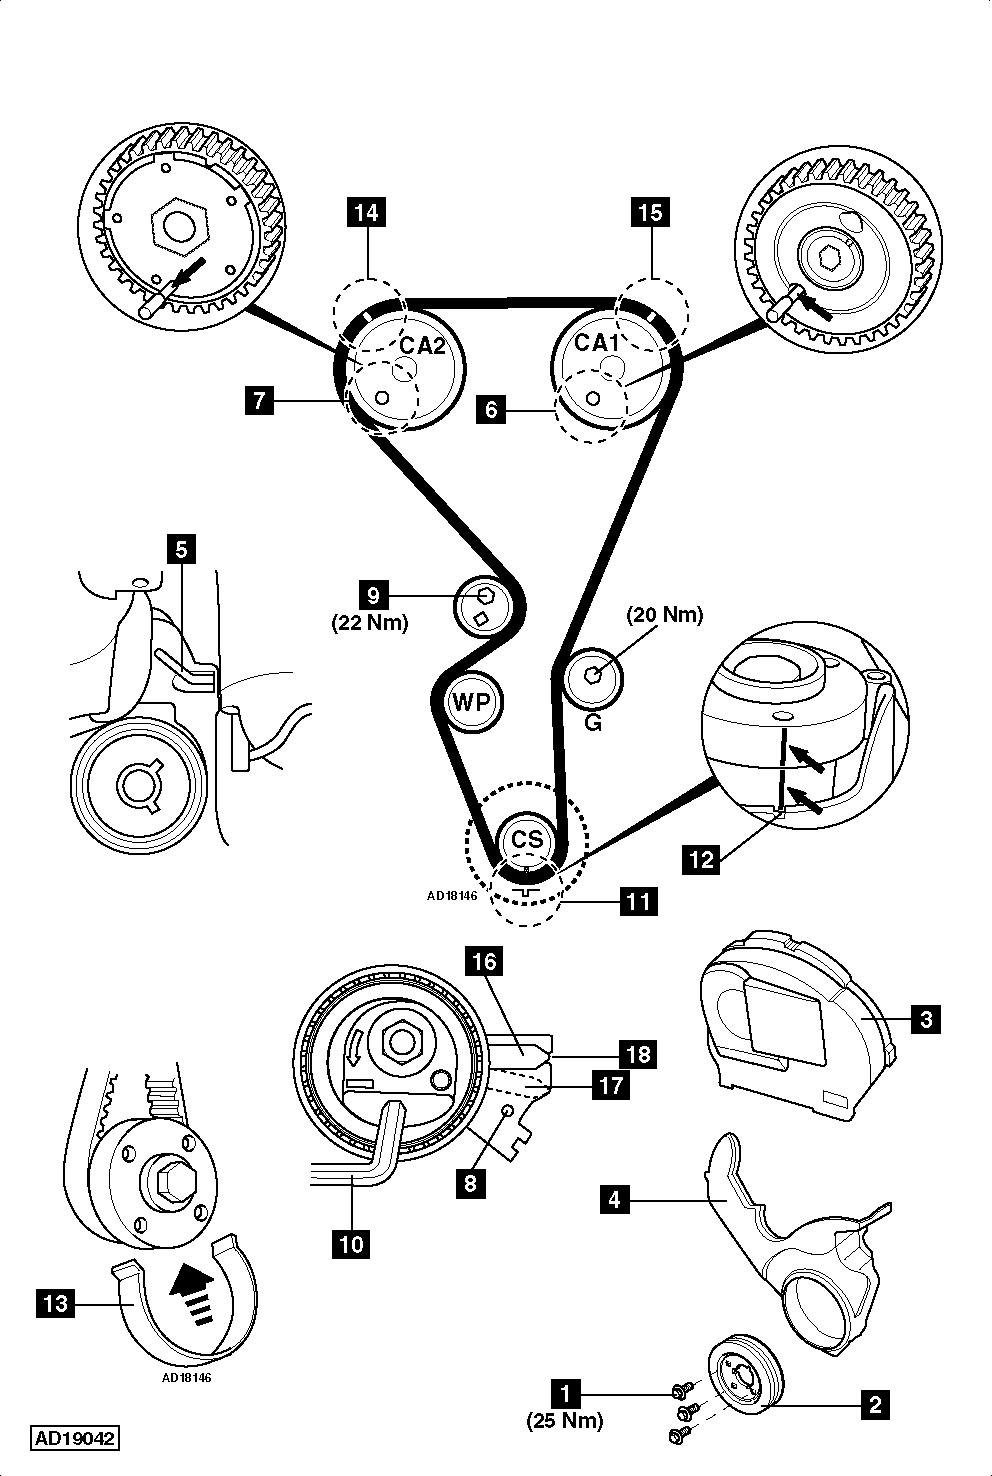 xf_5337] 2005 ford 4 0 engine diagram  tivexi throp kicep mohammedshrine librar wiring 101